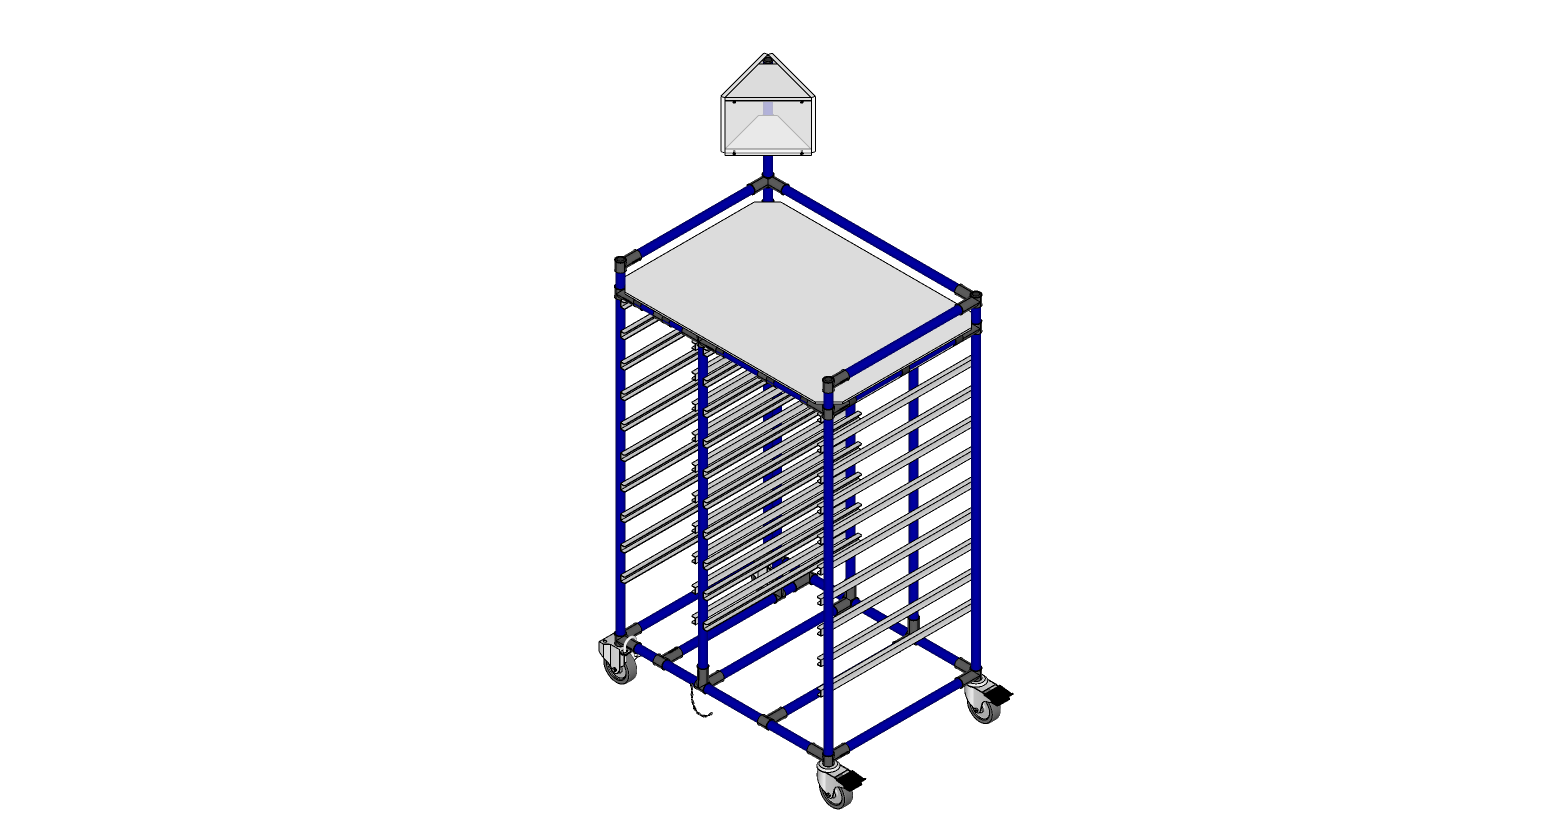 Drop point cart